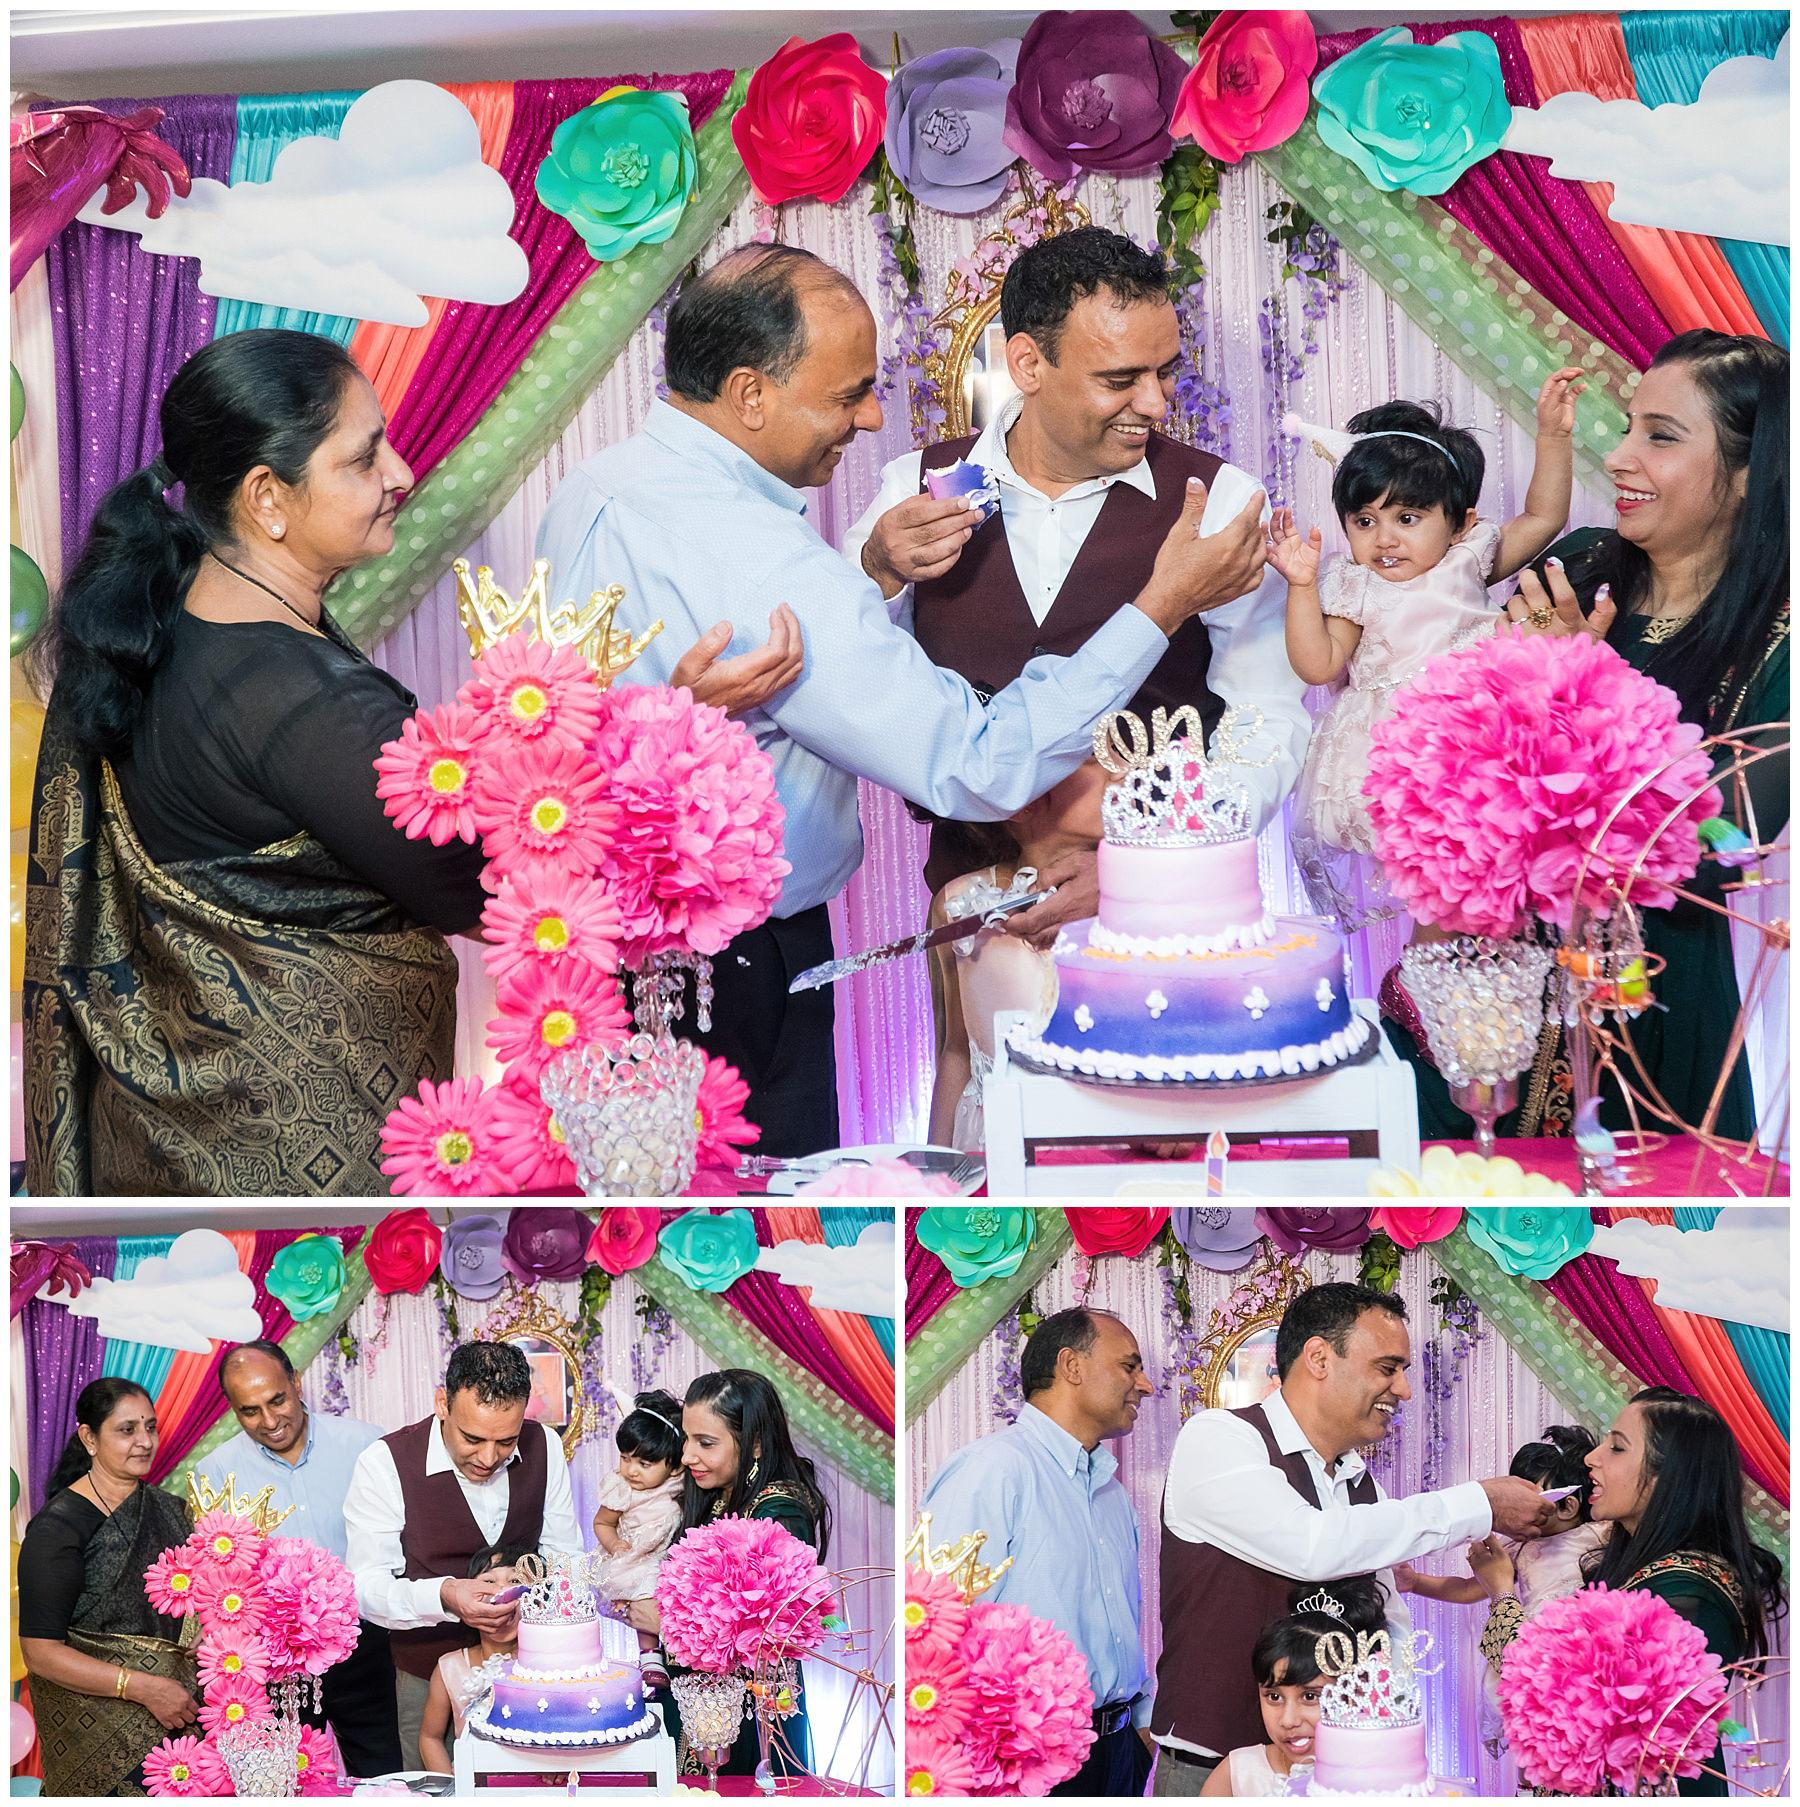 deewan-banquet-piscataway-nj-birthday-enanya-birthday-14.jpg